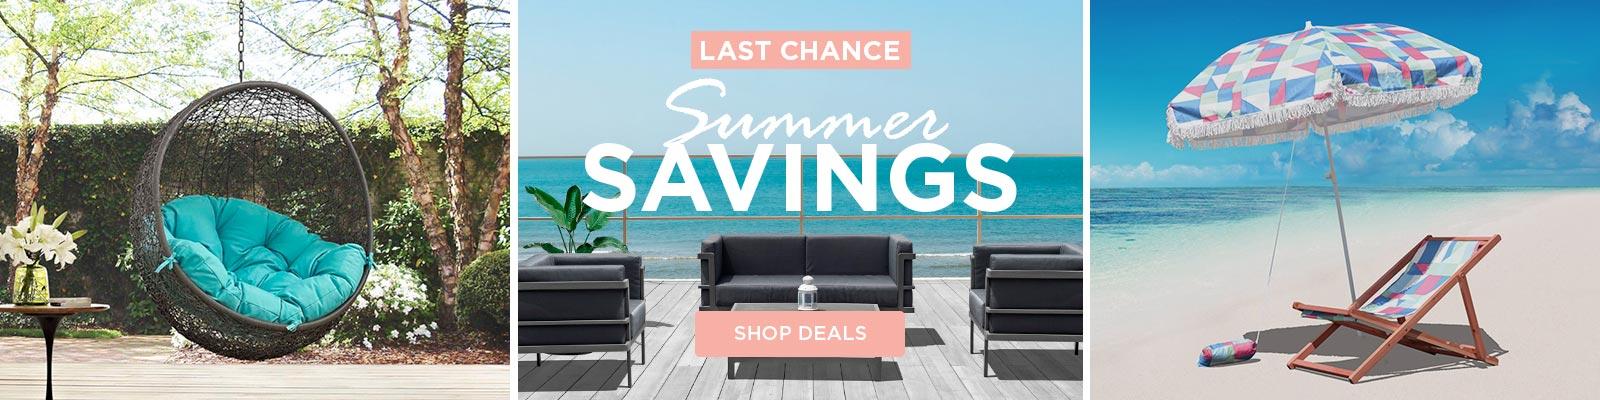 Last Chance Summer Savings